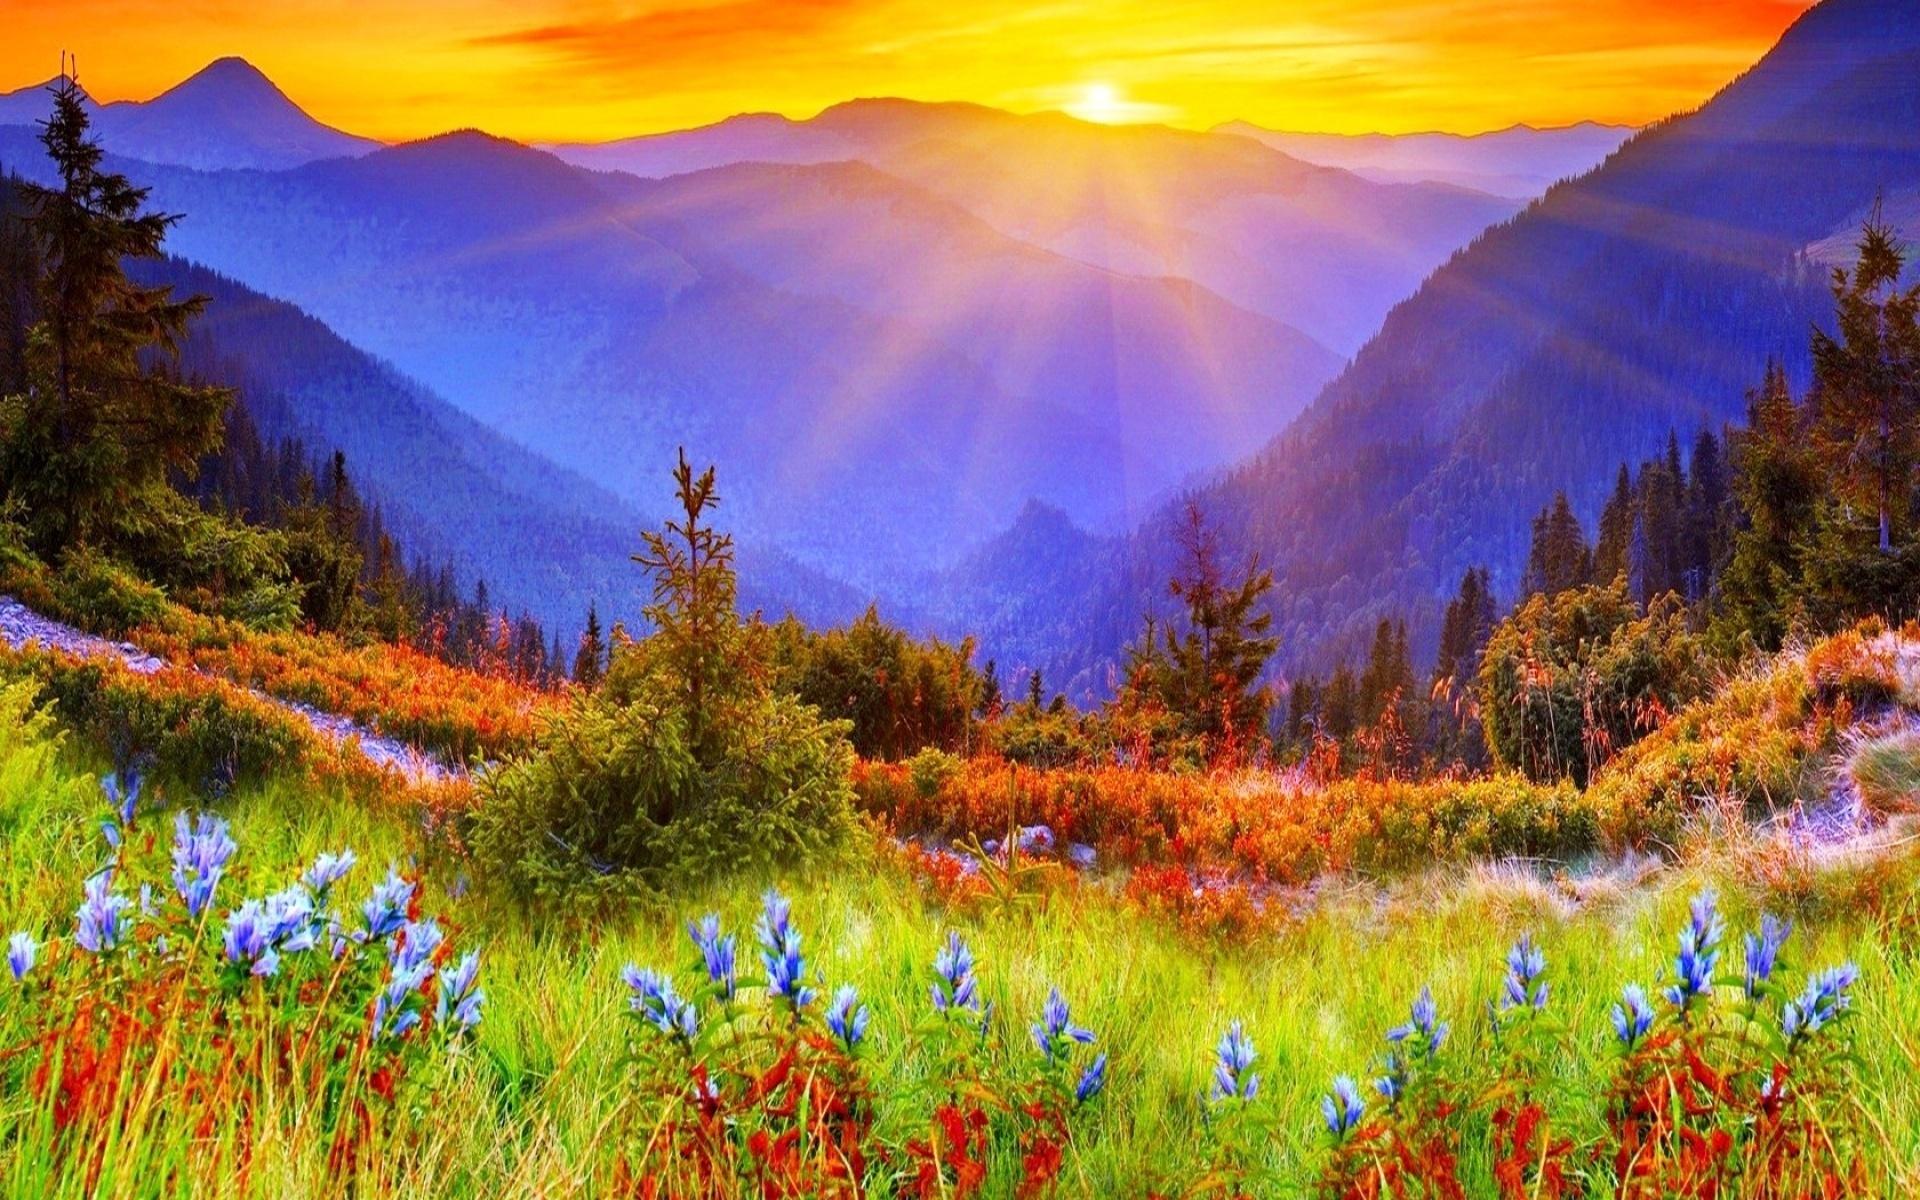 Morning Sun Beautiful Landscape Wallpapers 4 Life Mastery